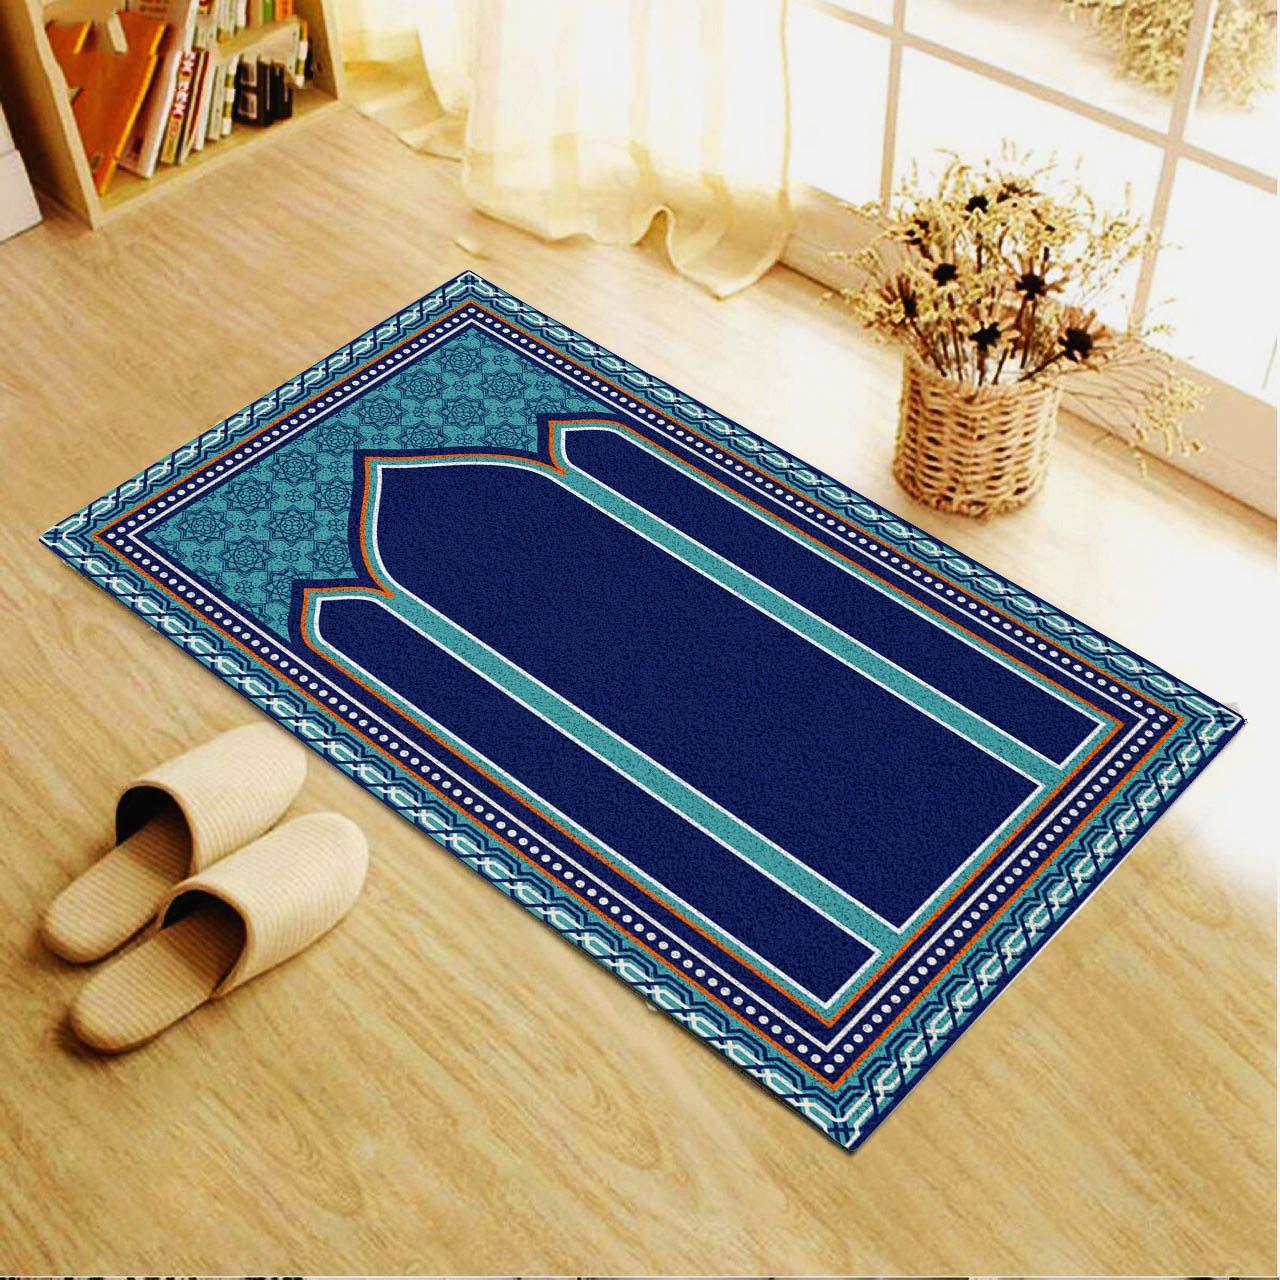 Prayer Mat, Prayer Rug, Prayer Mat Muslim, Prayer Mat Muslim For Kids, Prayer Mat Muslim Salat Musallah Rug Turkish